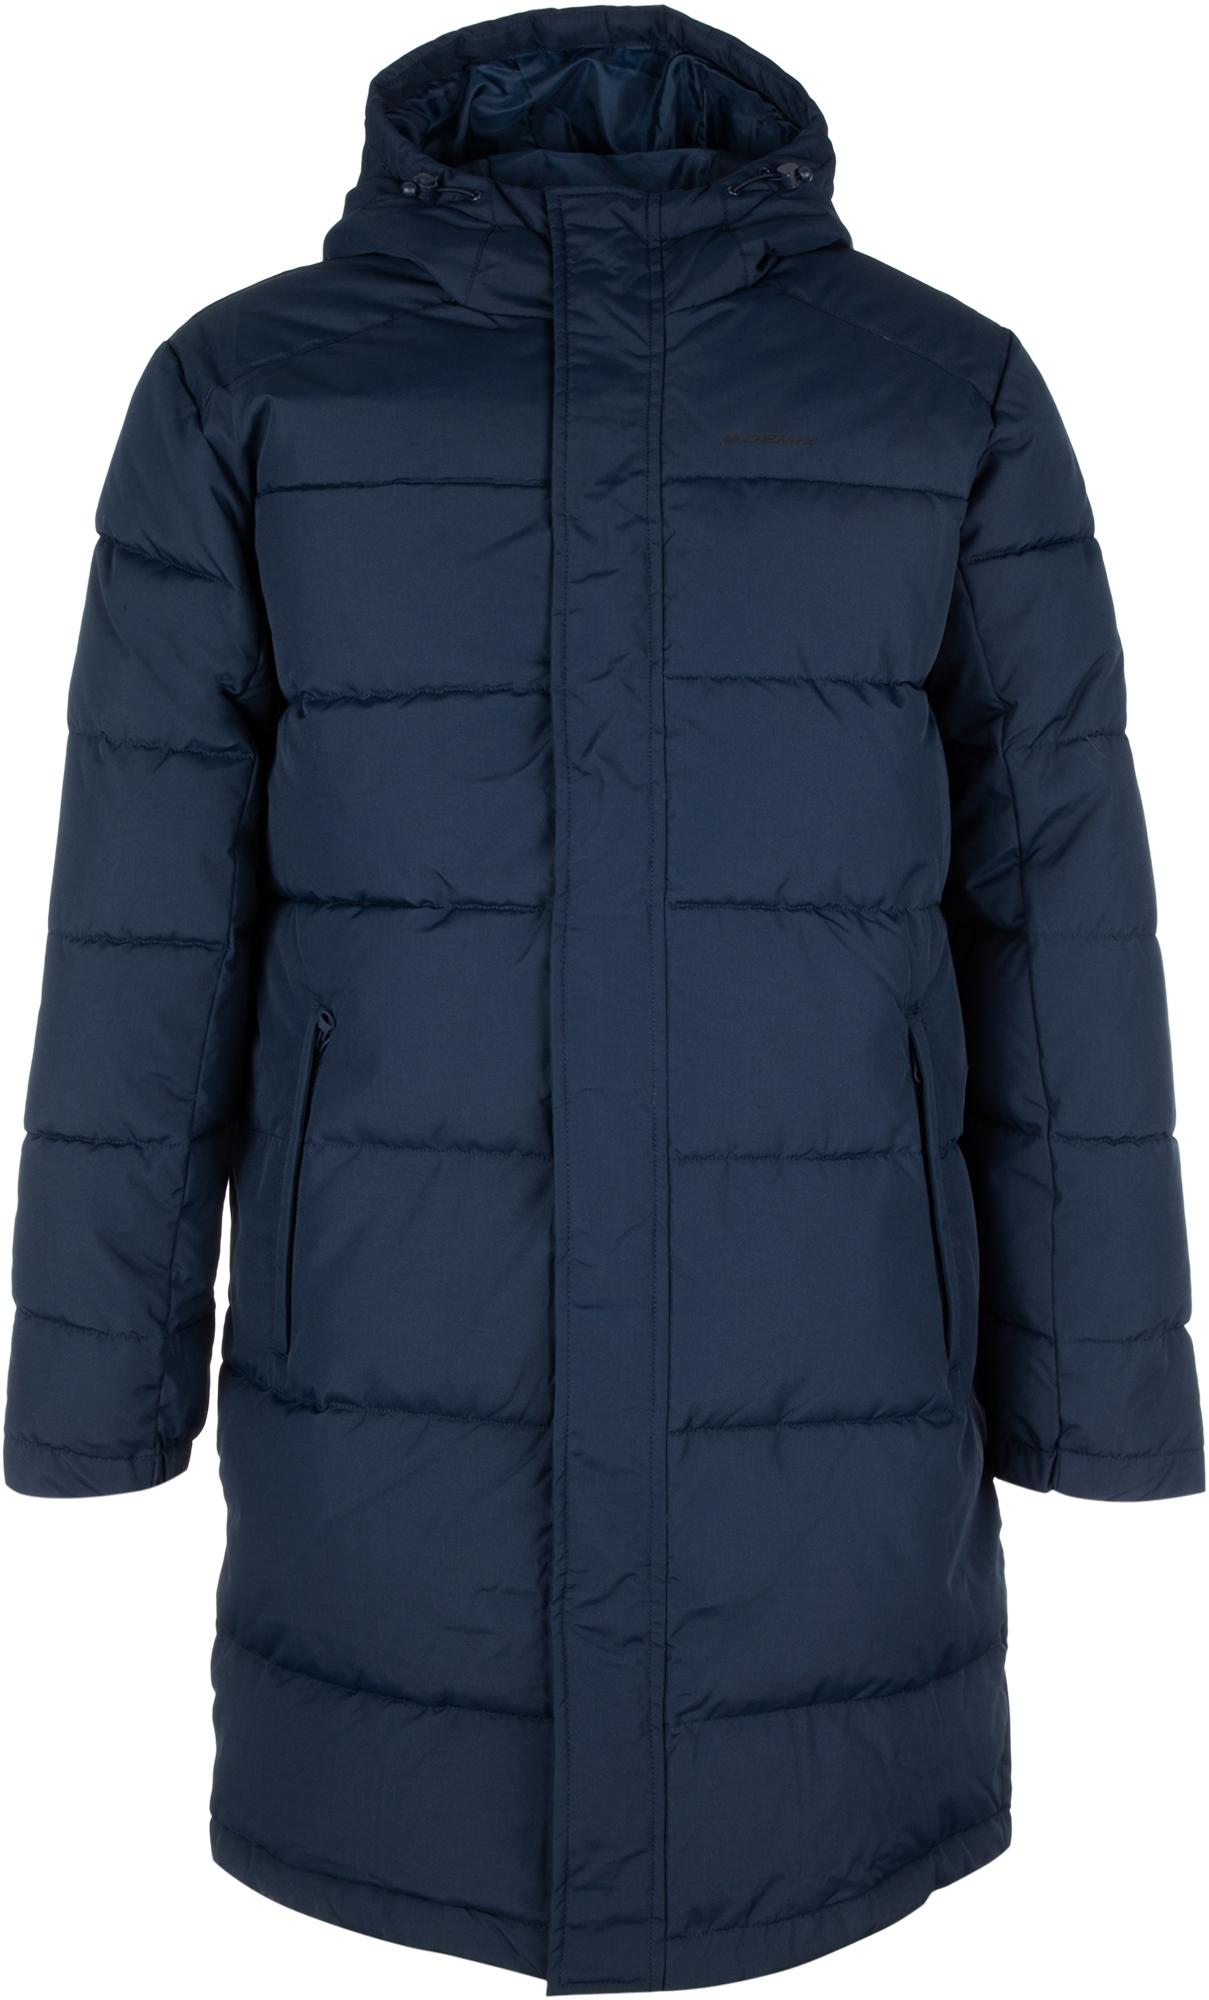 Demix Куртка утепленная мужская Demix, размер 54 куртка мужская dc shoes цвет серый edyjk03161 bmk0 размер xxl 54